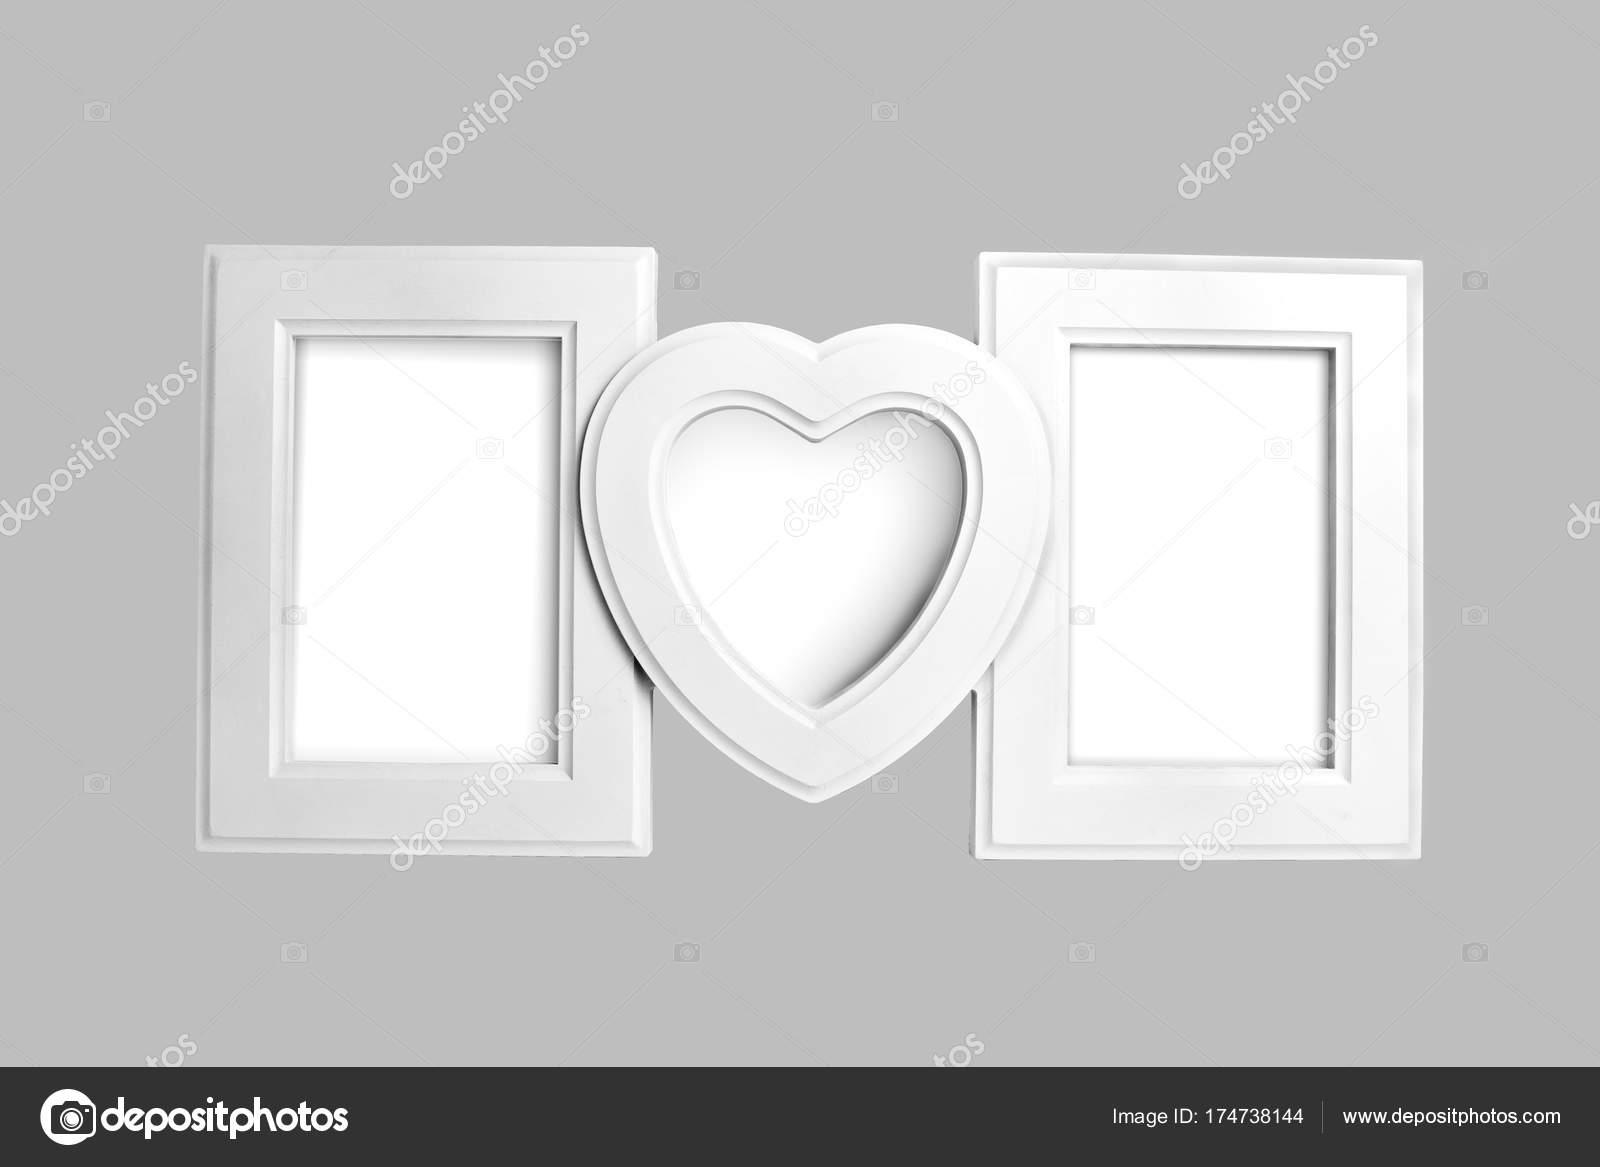 Weiße Holz Bilderrahmen Familie — Stockfoto © fontgraf #174738144